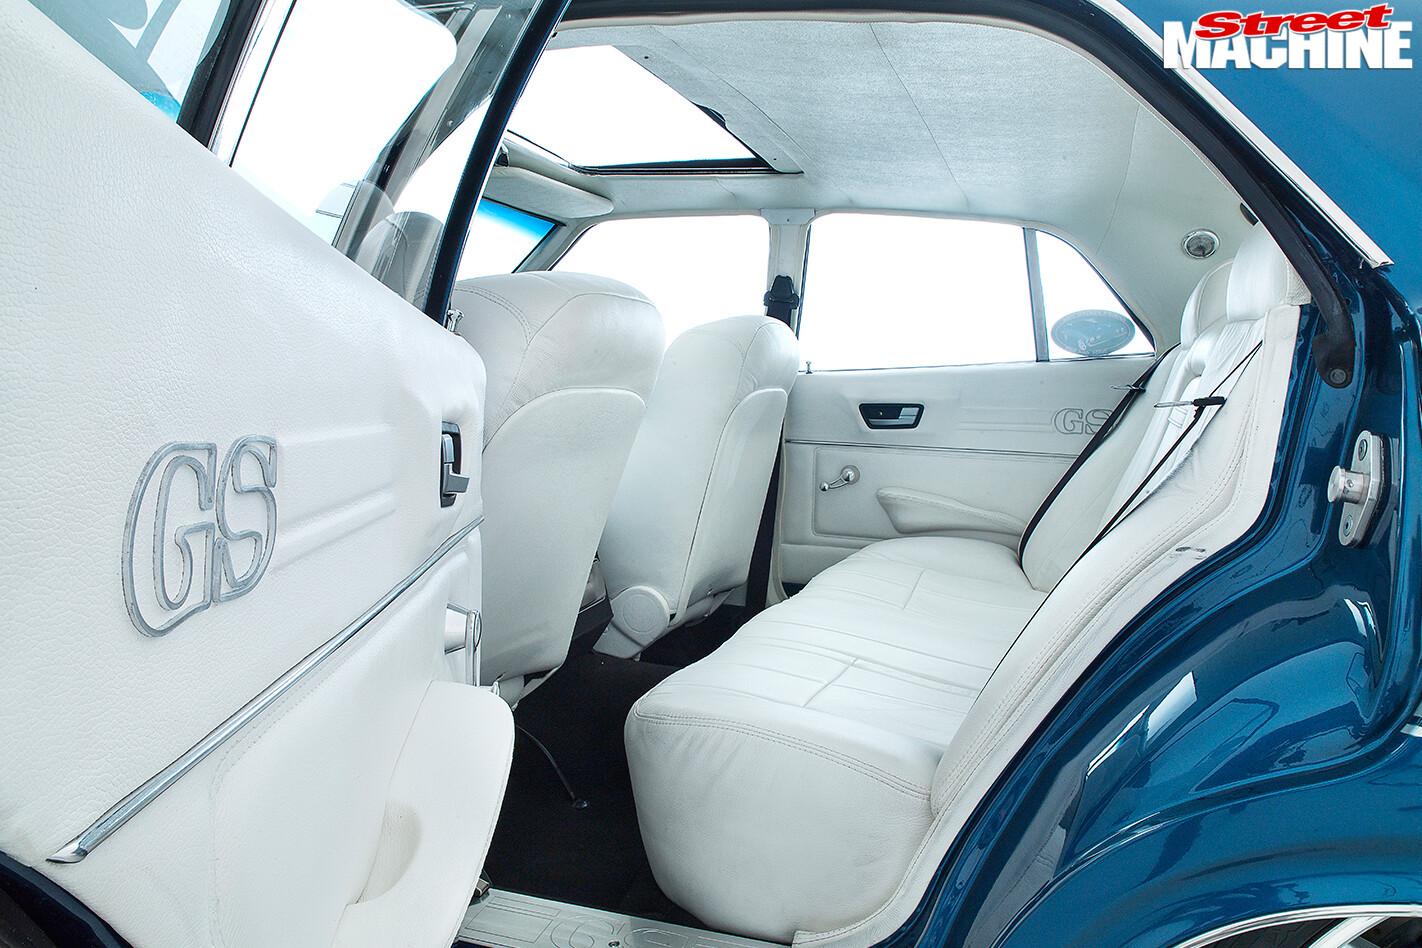 Ford -XB-Falcon -Fairmont -GS-interior -rear